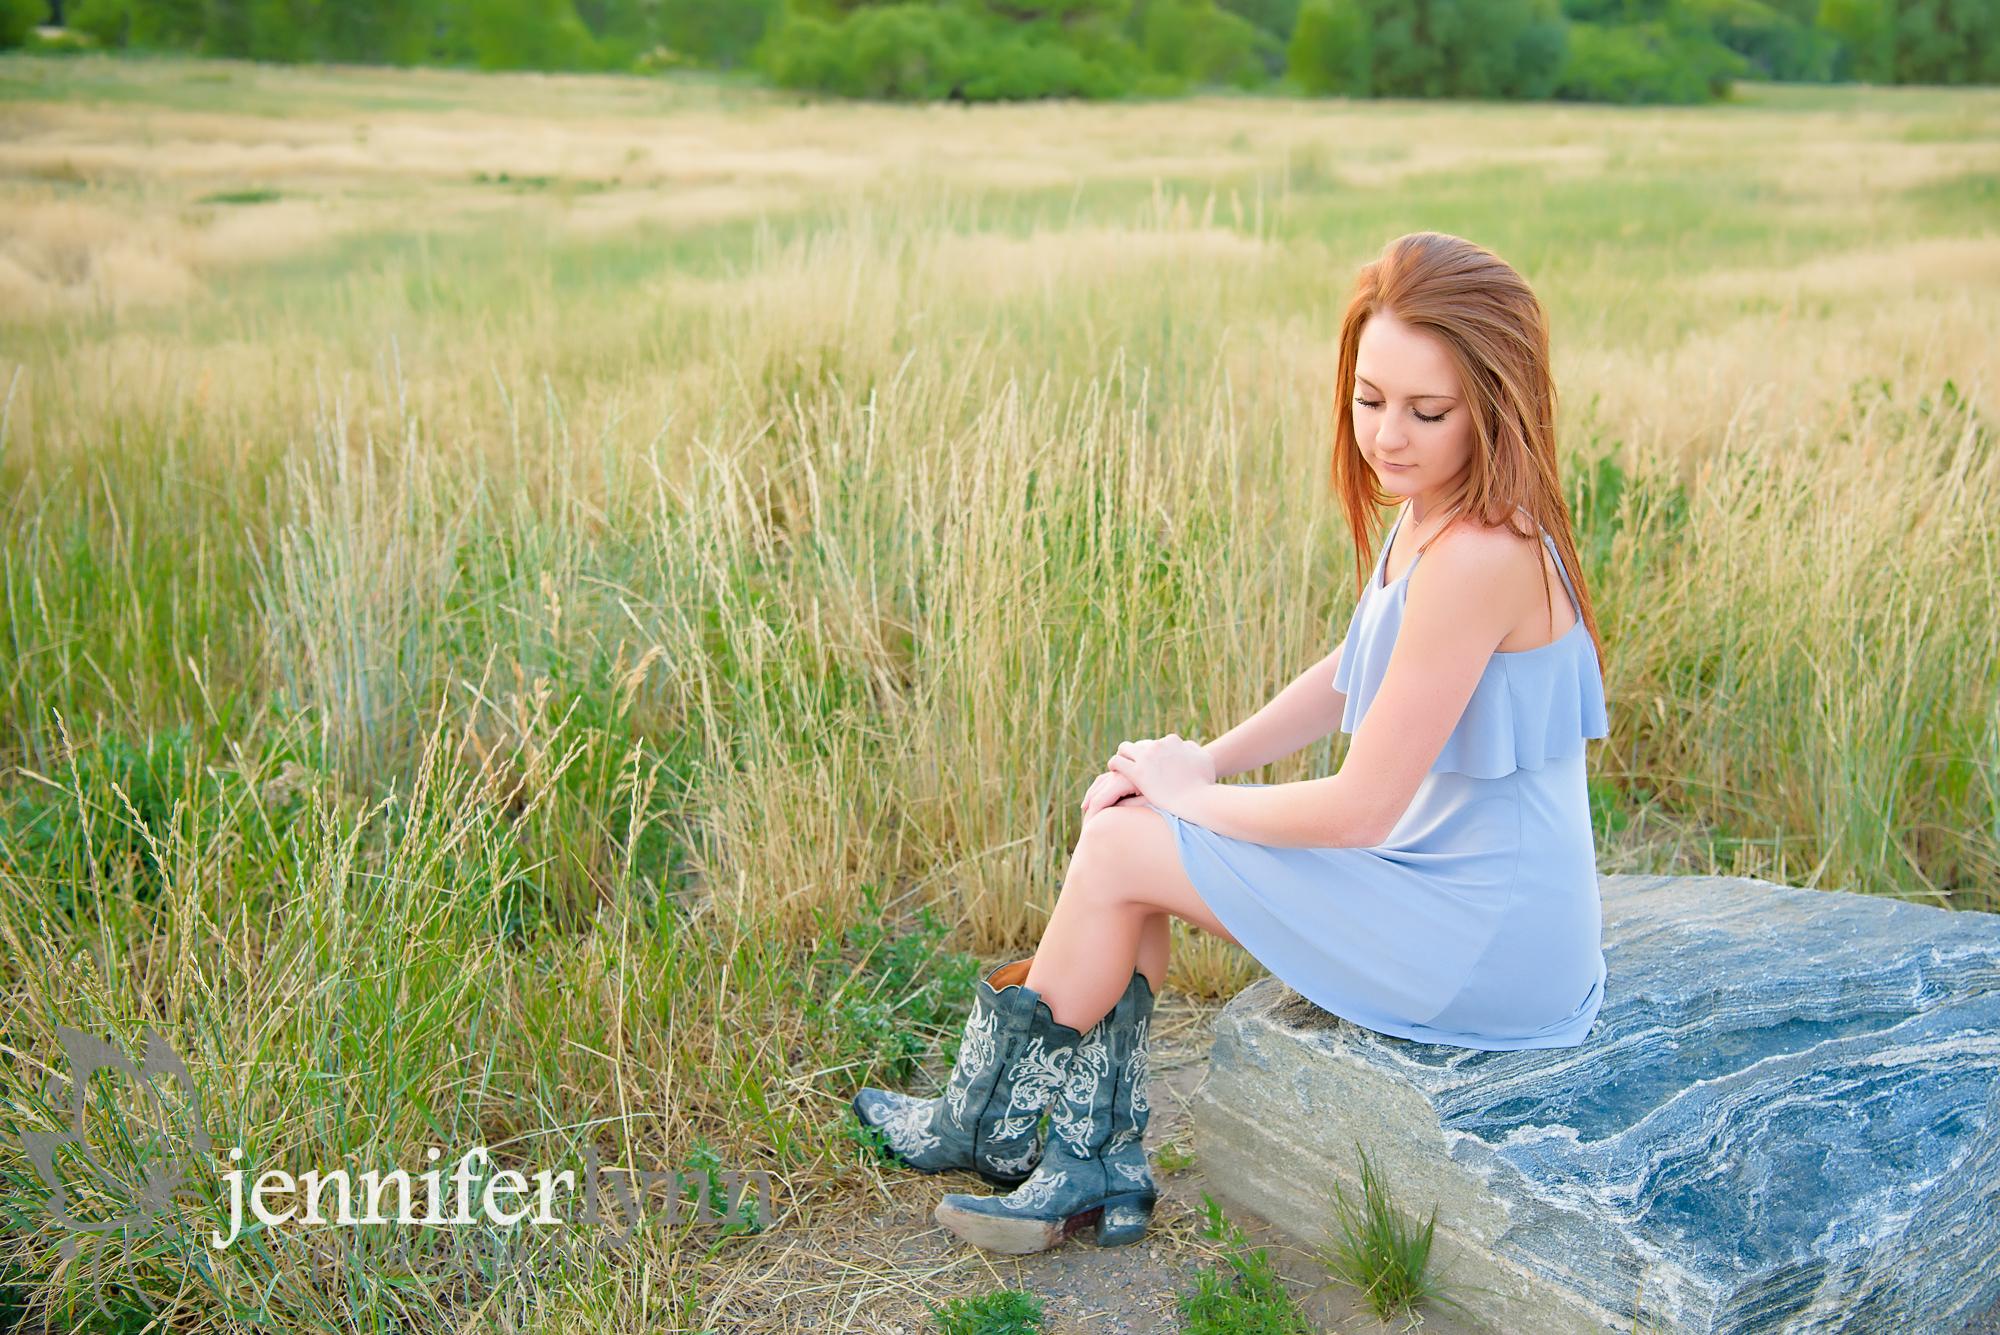 Photo 7: Elaina Senior